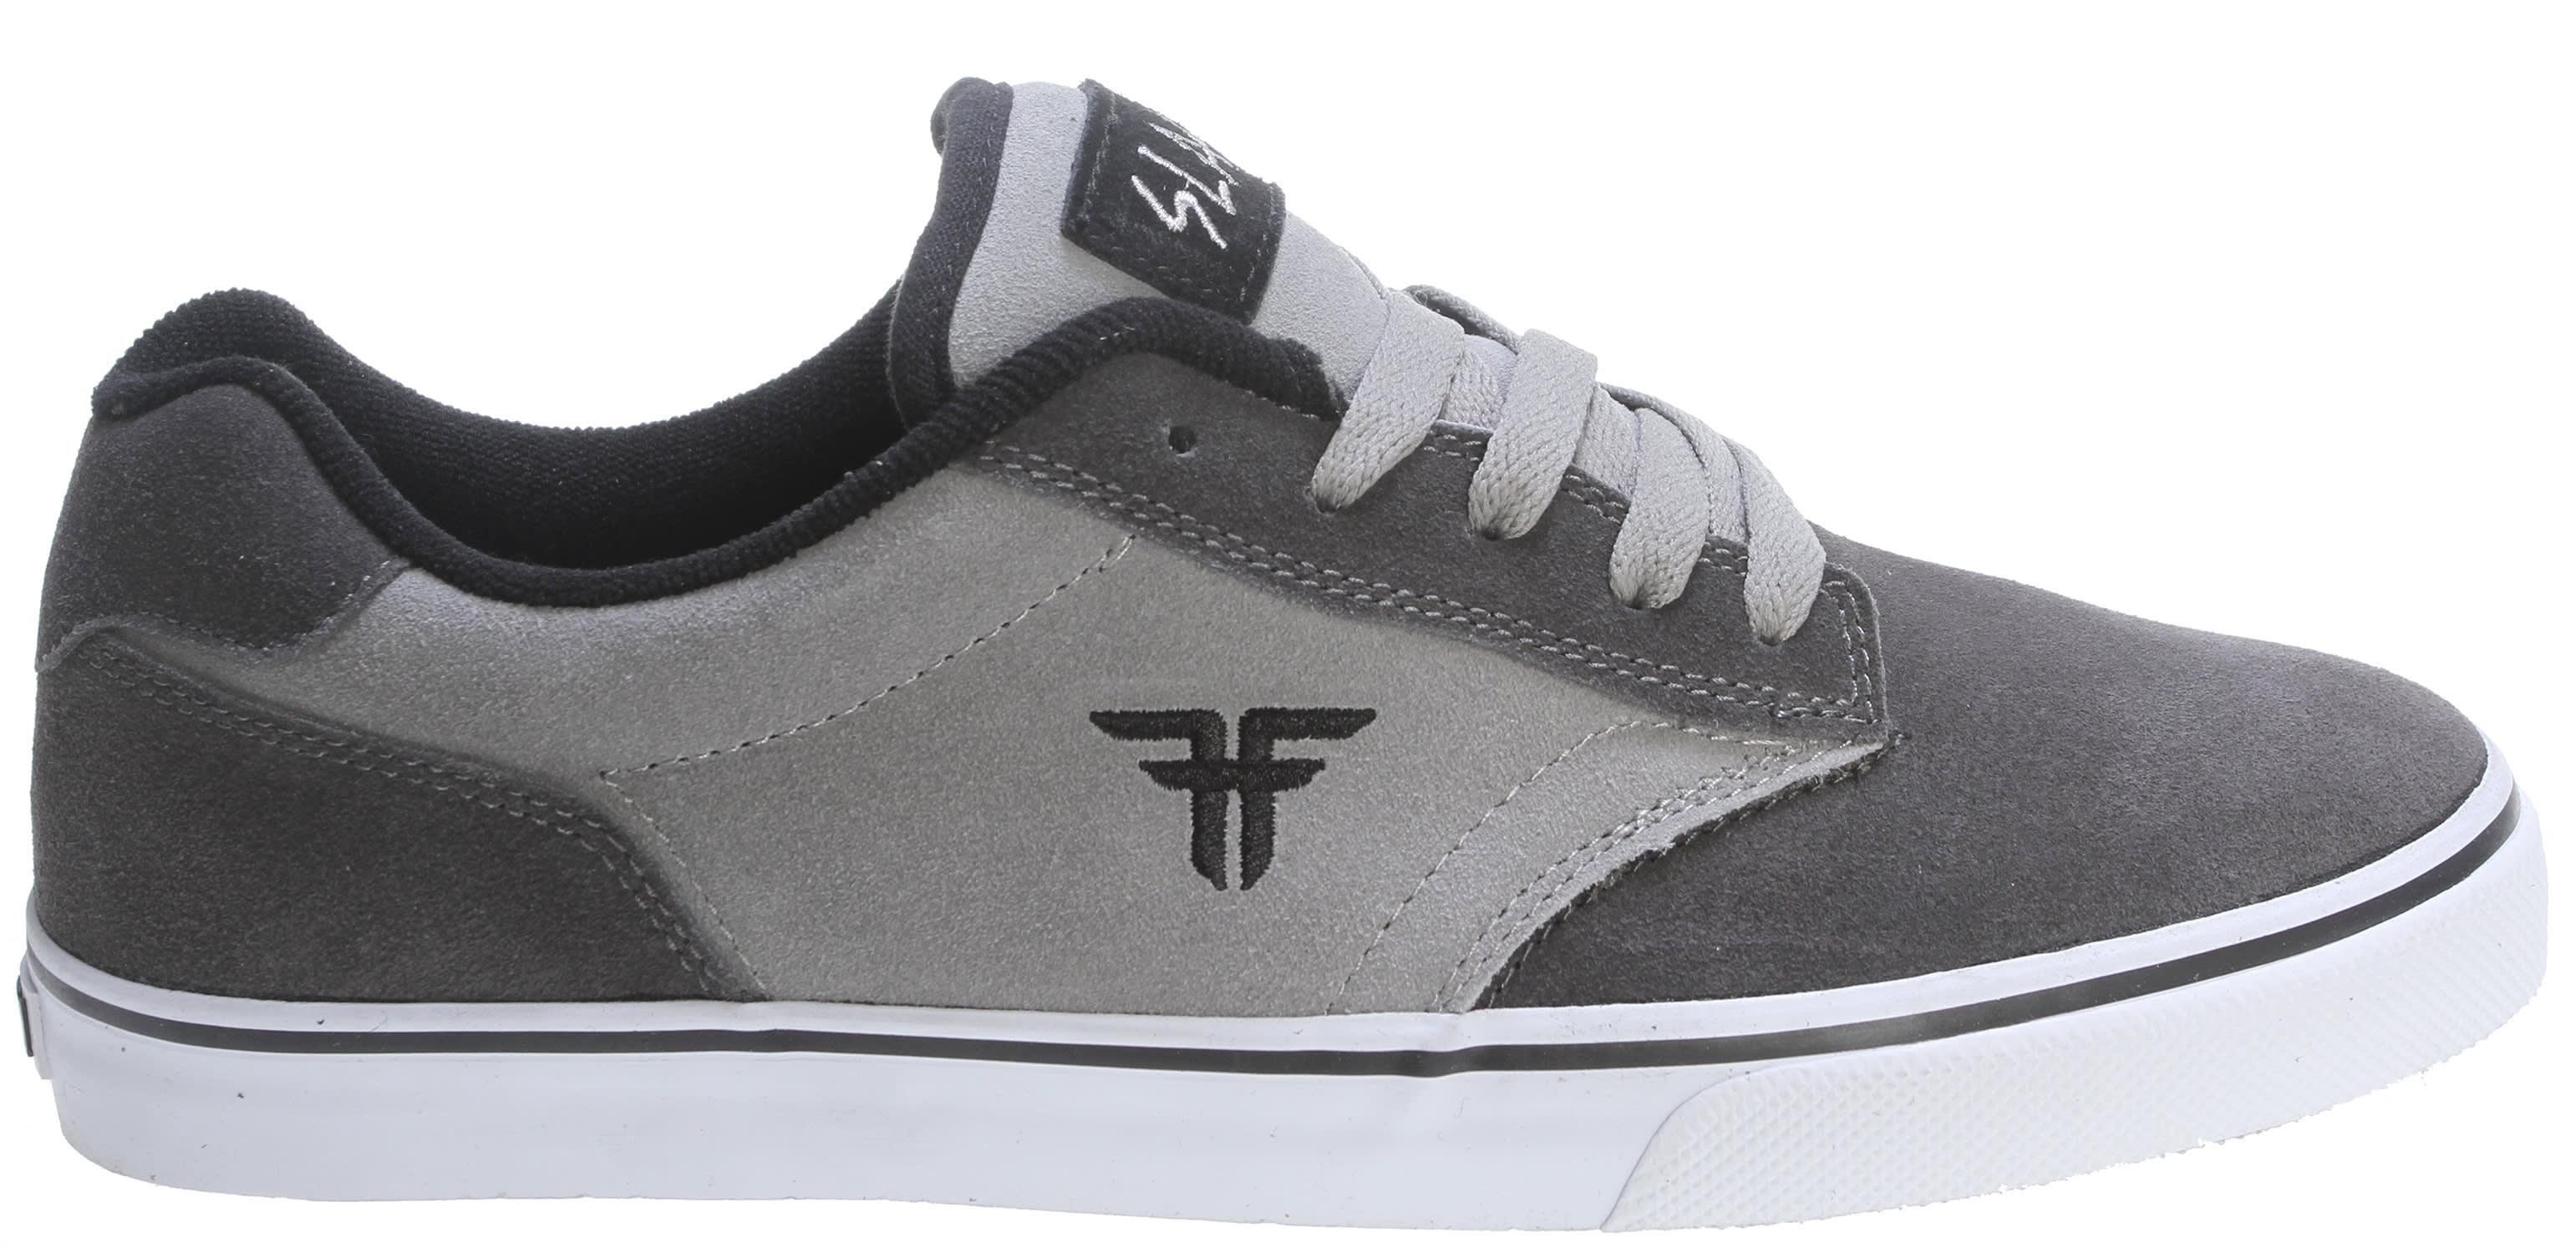 38e702d8e0 Fallen Slash Skate Shoes - thumbnail 1